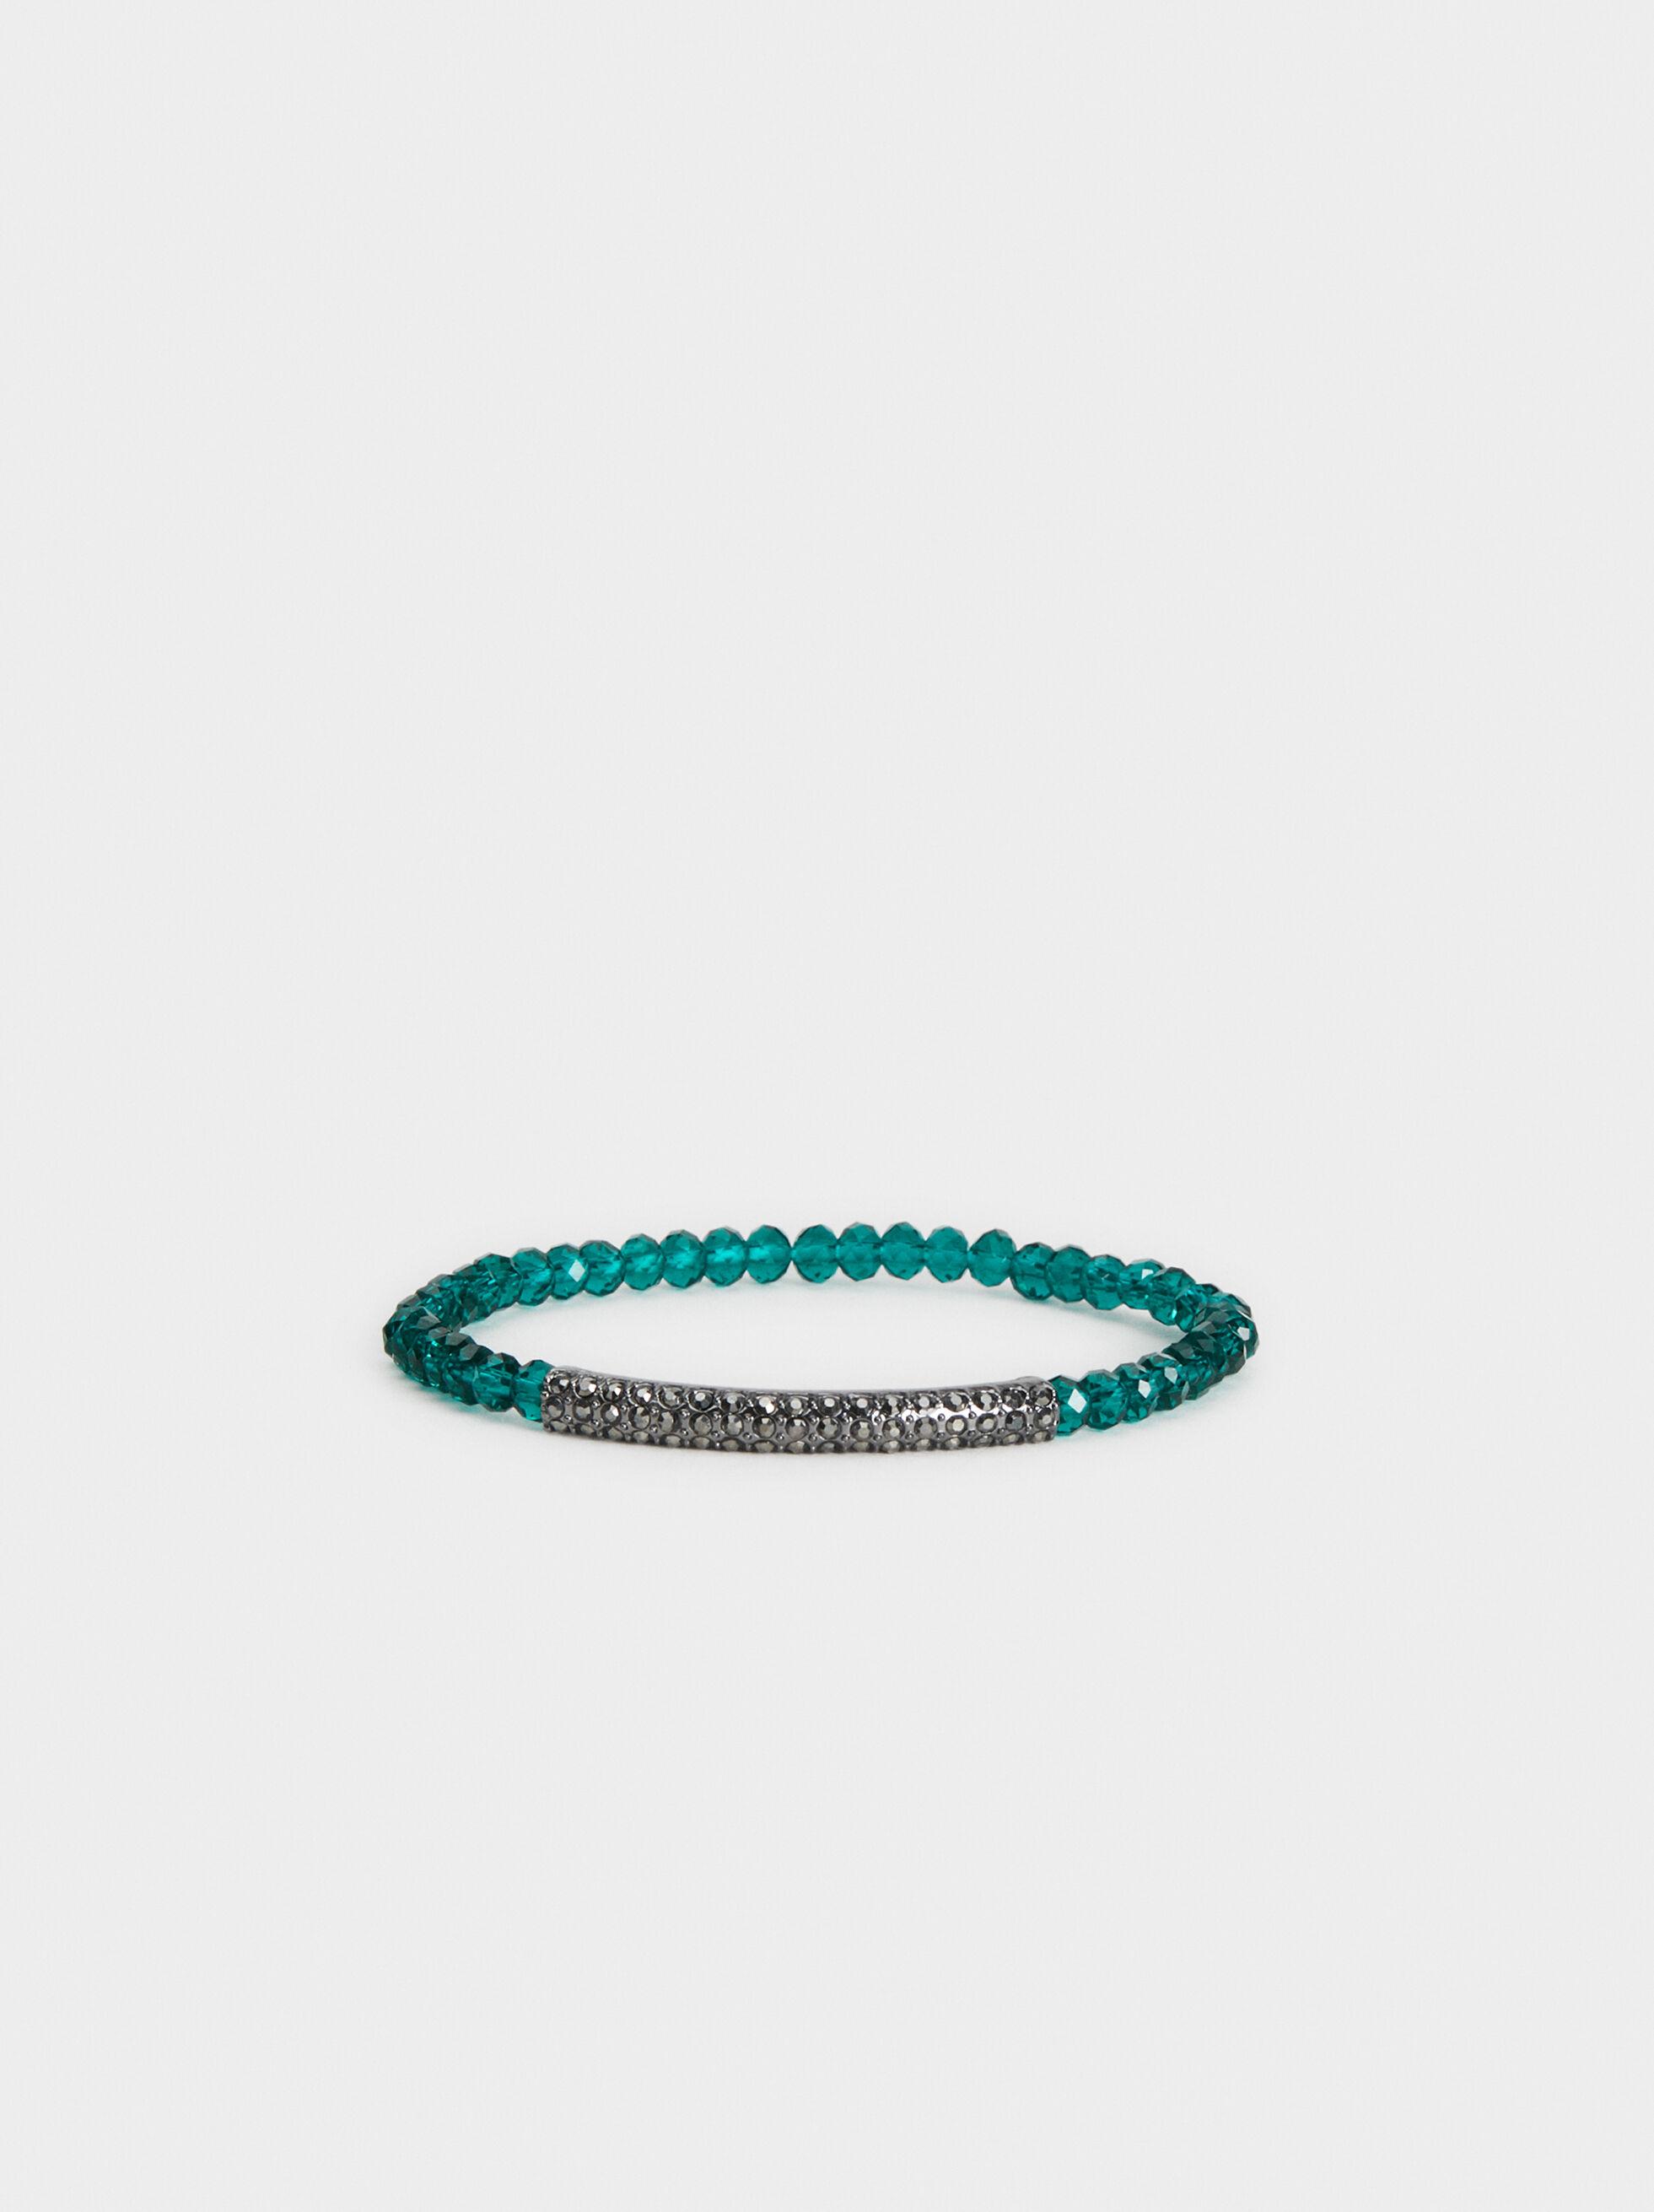 Botanical Party Elasticated Bracelet, Multicolor, hi-res